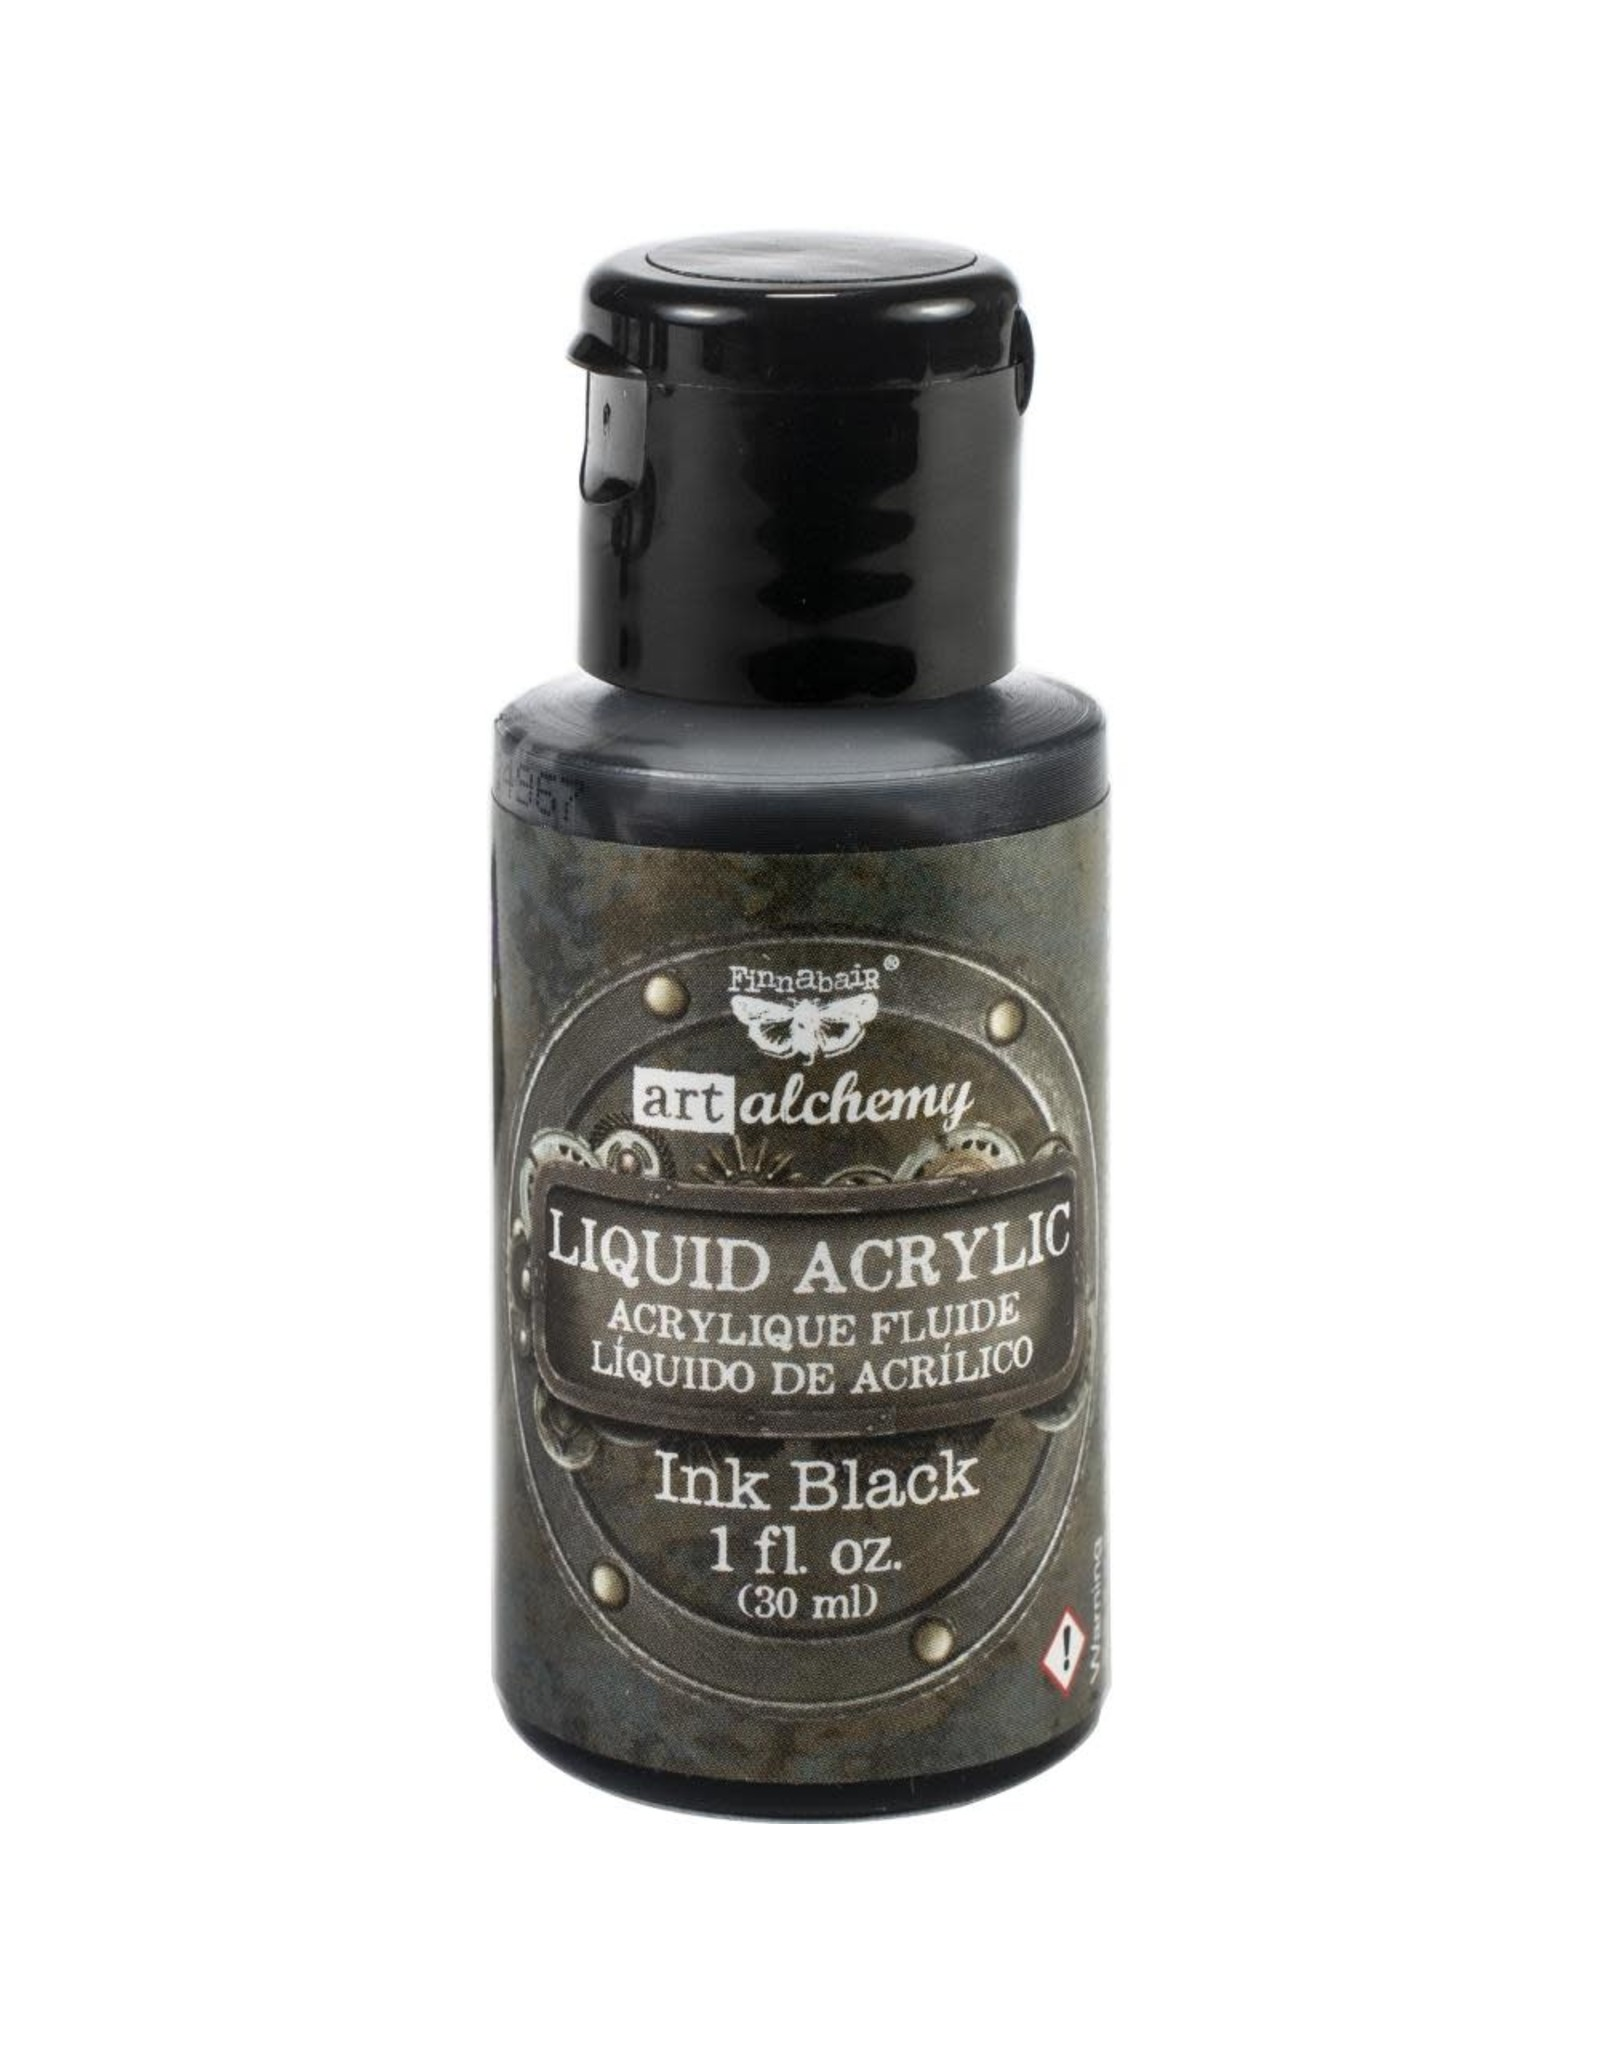 PRIMA MARKETING INC Art Alchemy Liquid Acrylic Paint - Ink Black